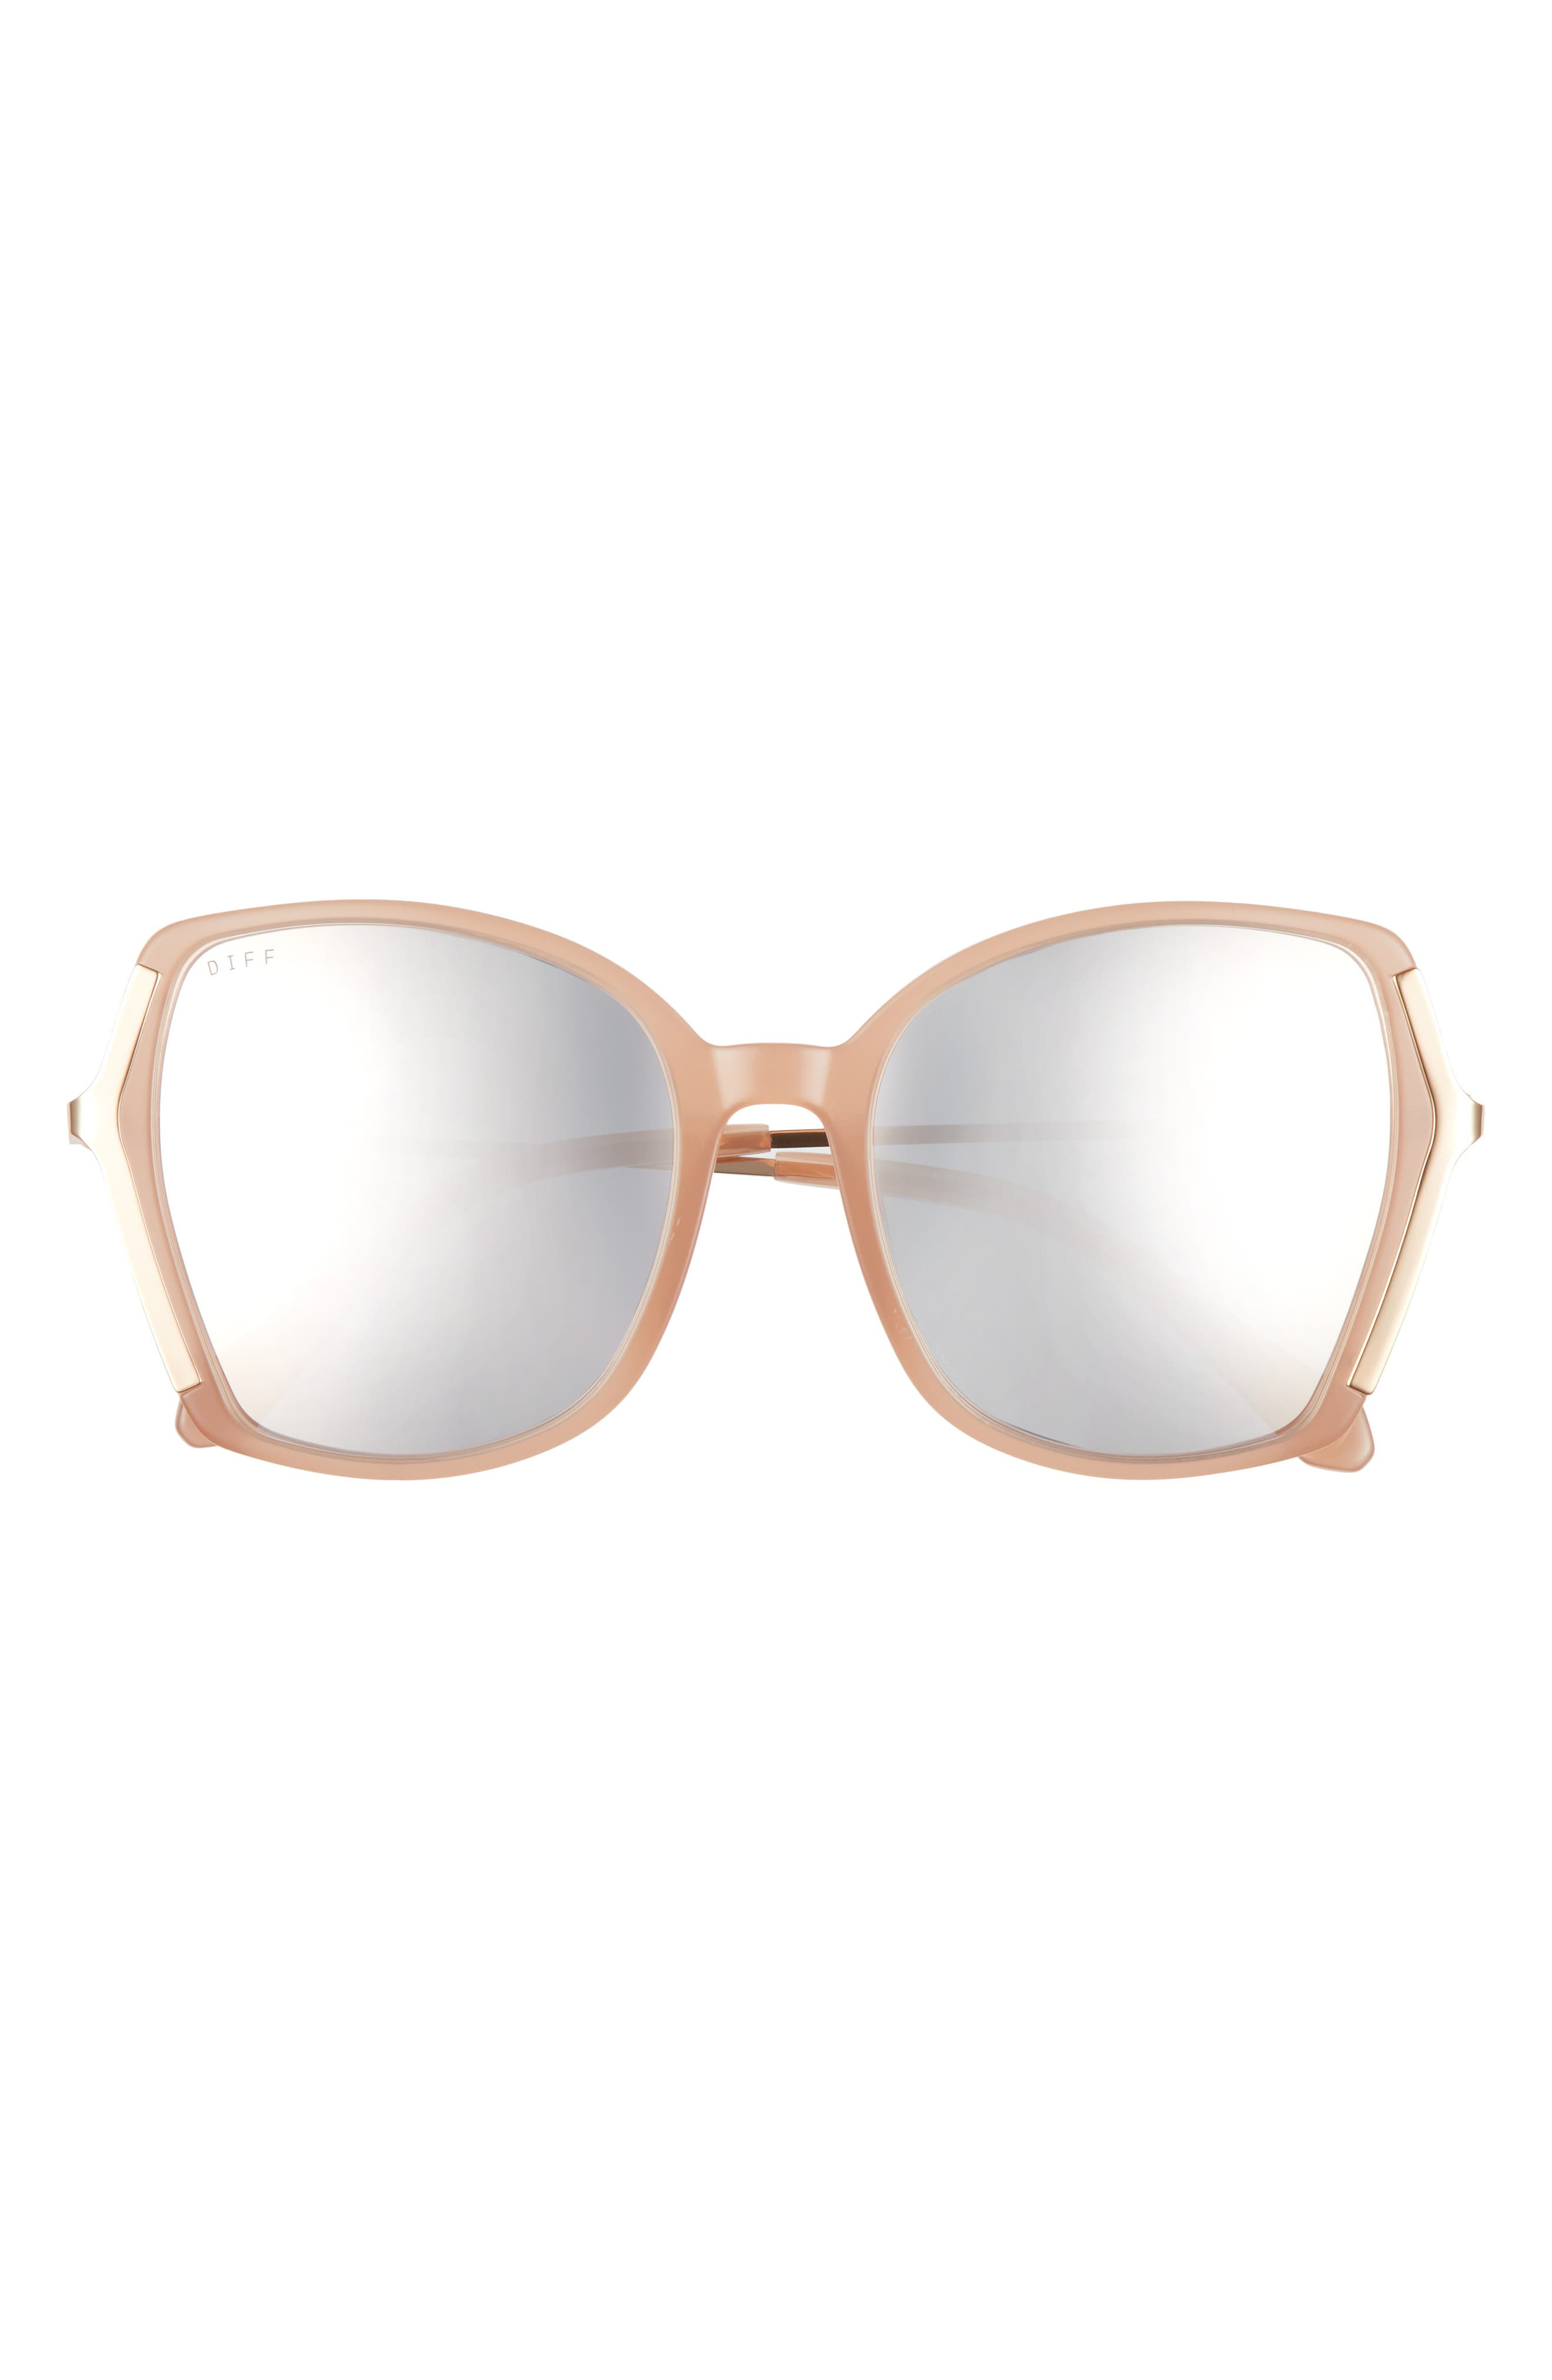 Donna Ii 55mm Gradient Round Sunglasses